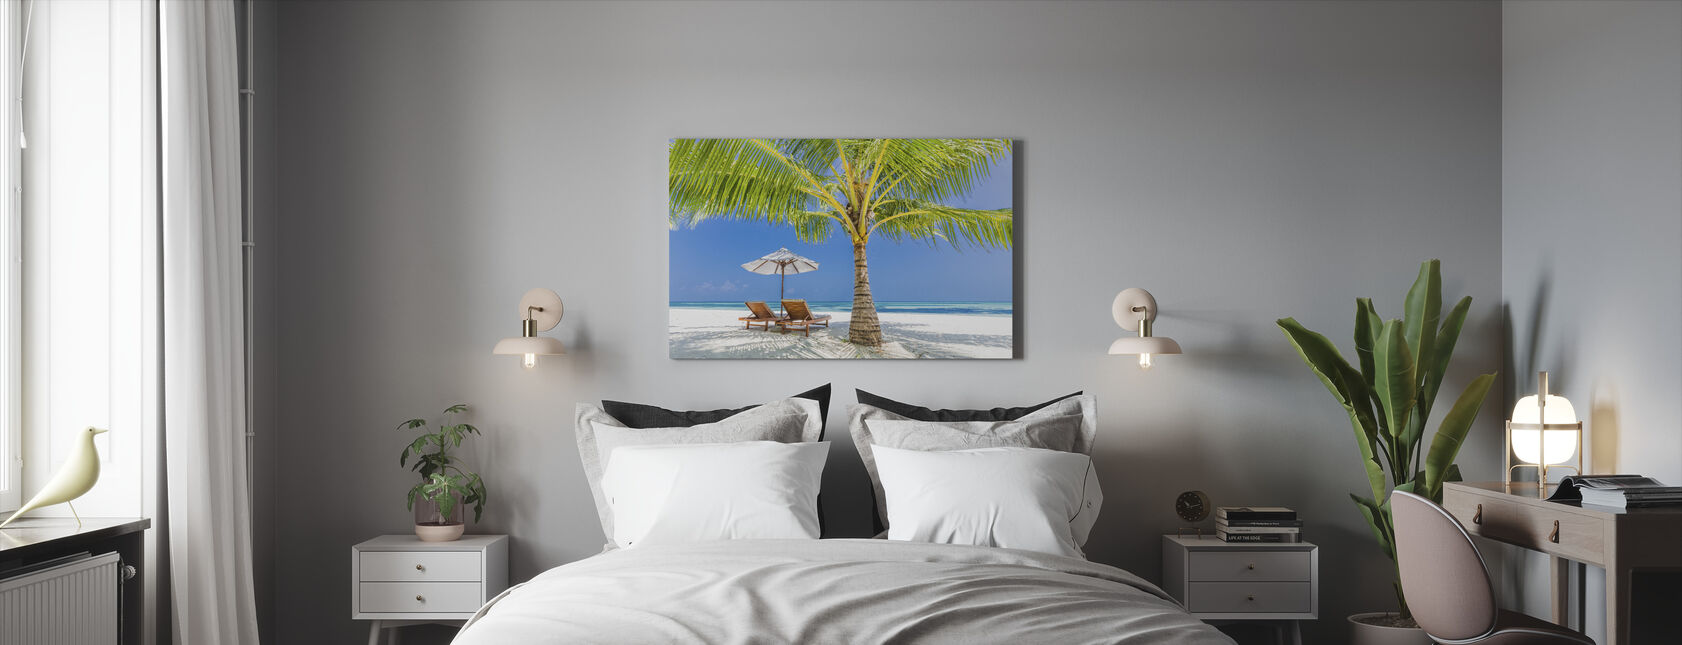 Tranquil Beach - Canvas print - Bedroom